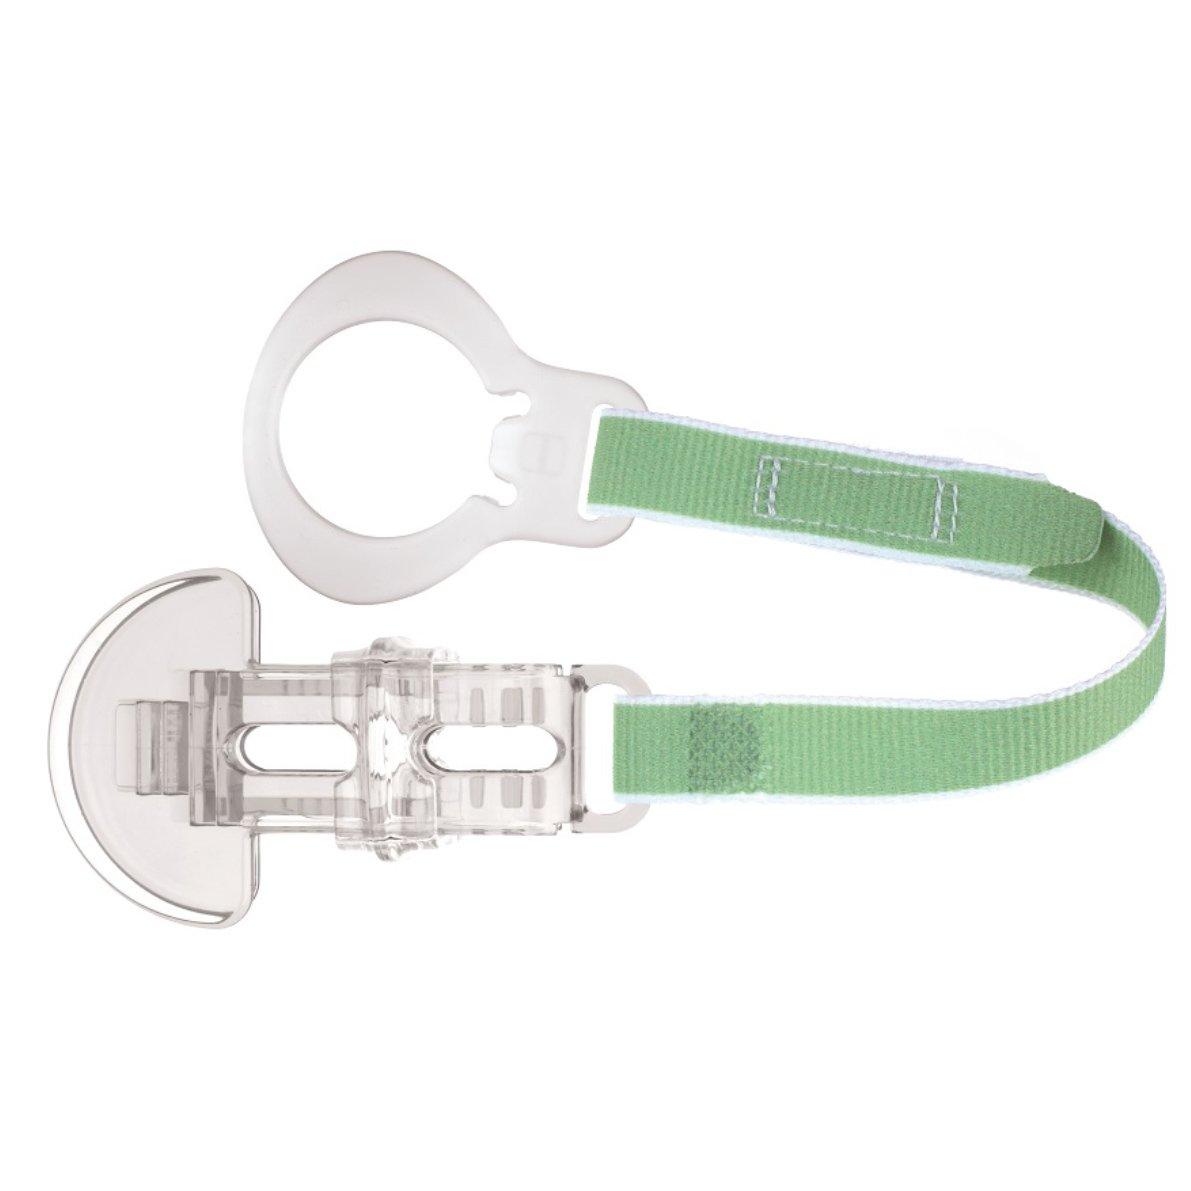 Mam Clip Κωδ 310 Κορδέλα Στήριξης Πιπίλας, από 0+ Μηνών 1 Τεμάχιο – πράσινο